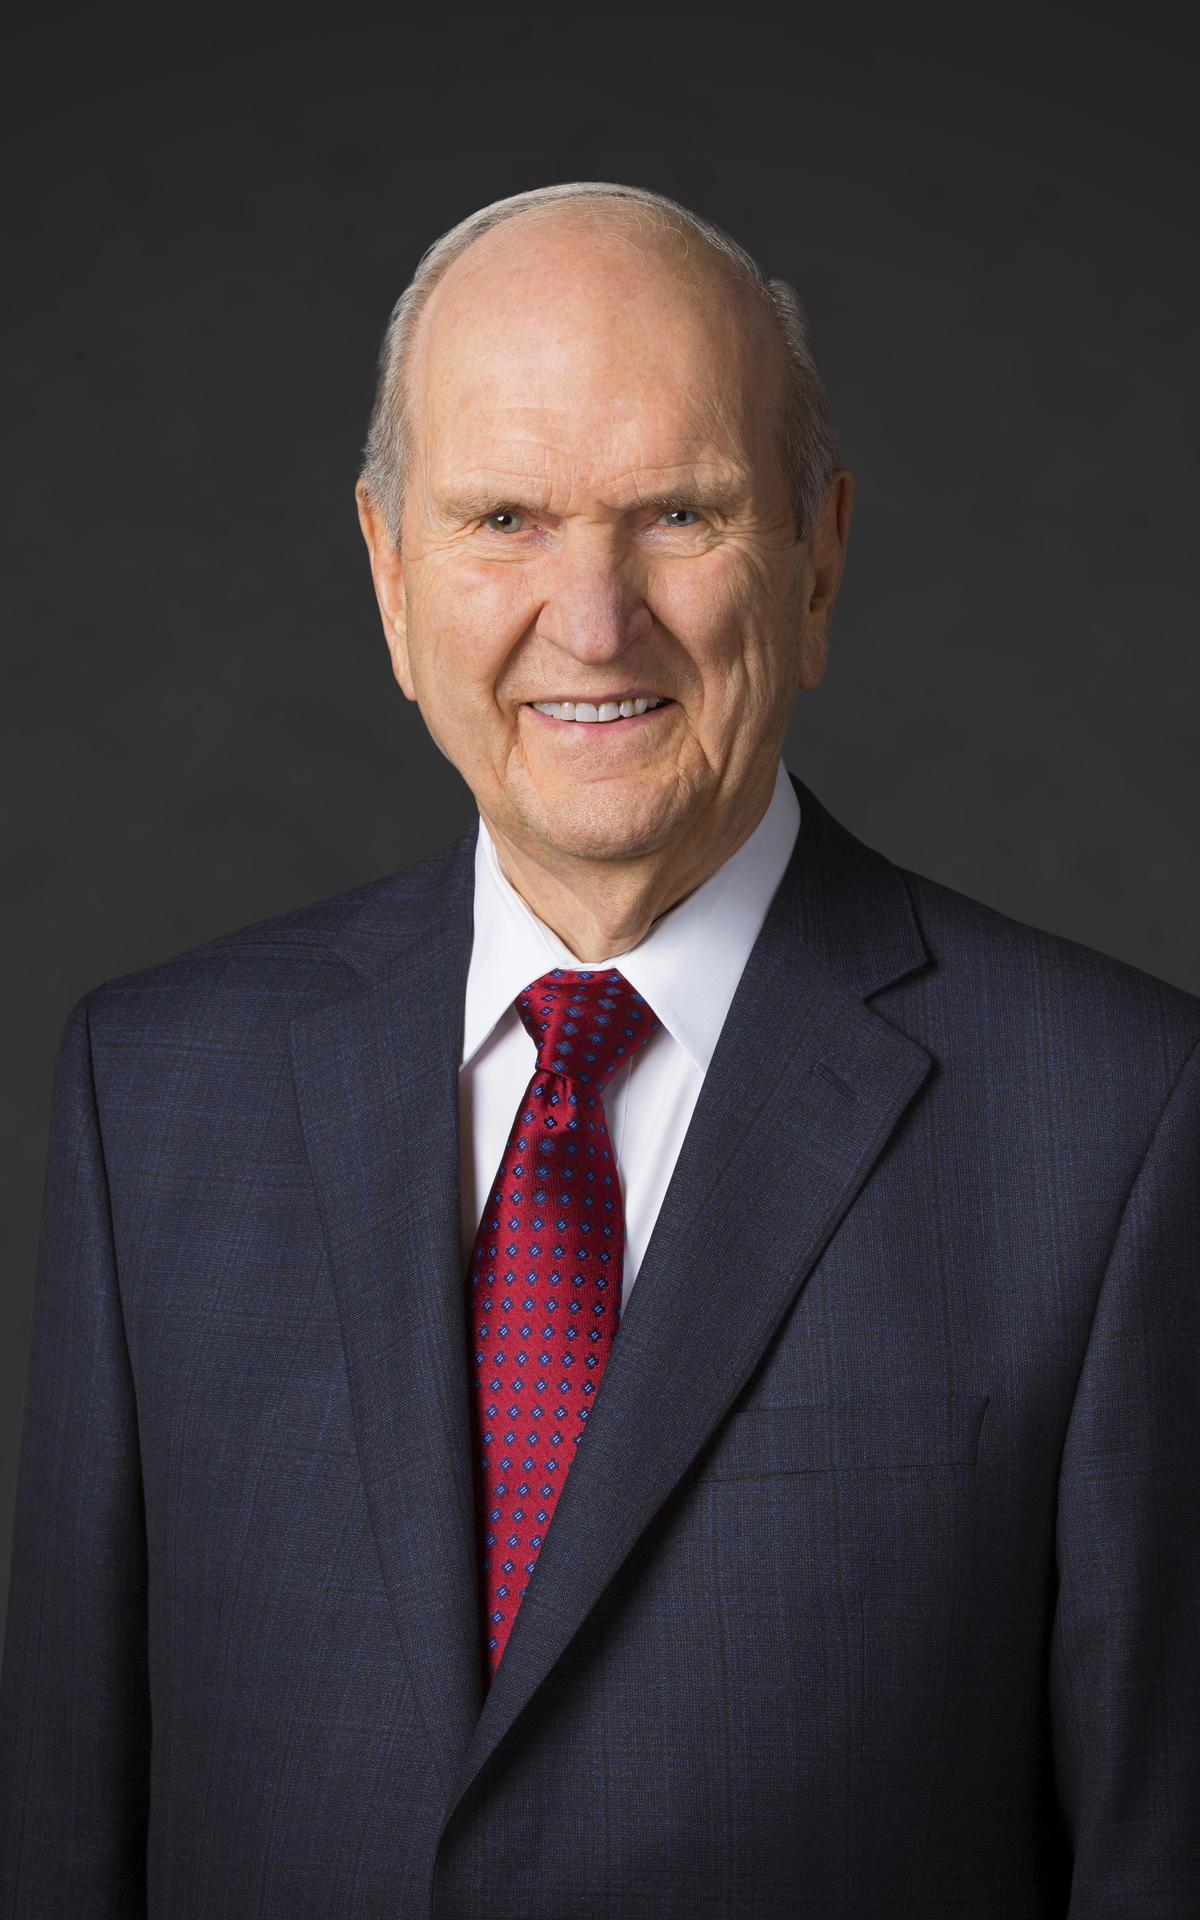 Presidente Russell M. Nelson